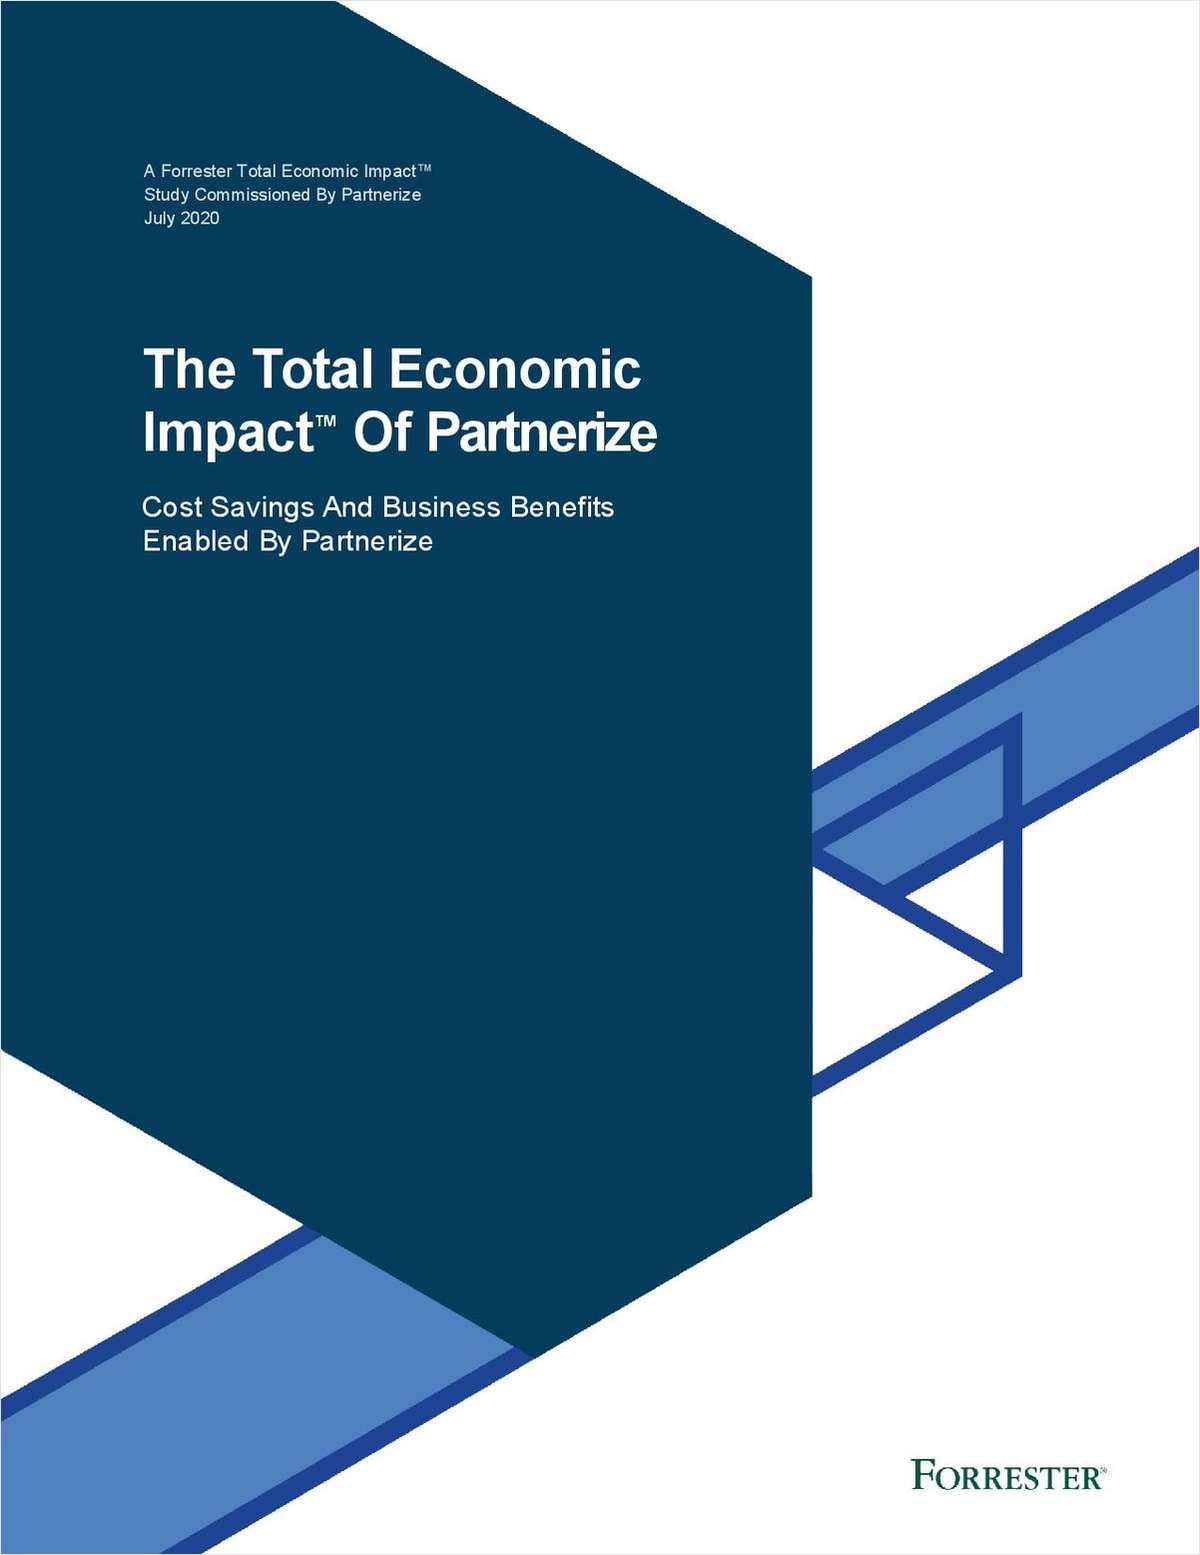 The Total Economic Impact™ of Partnerize